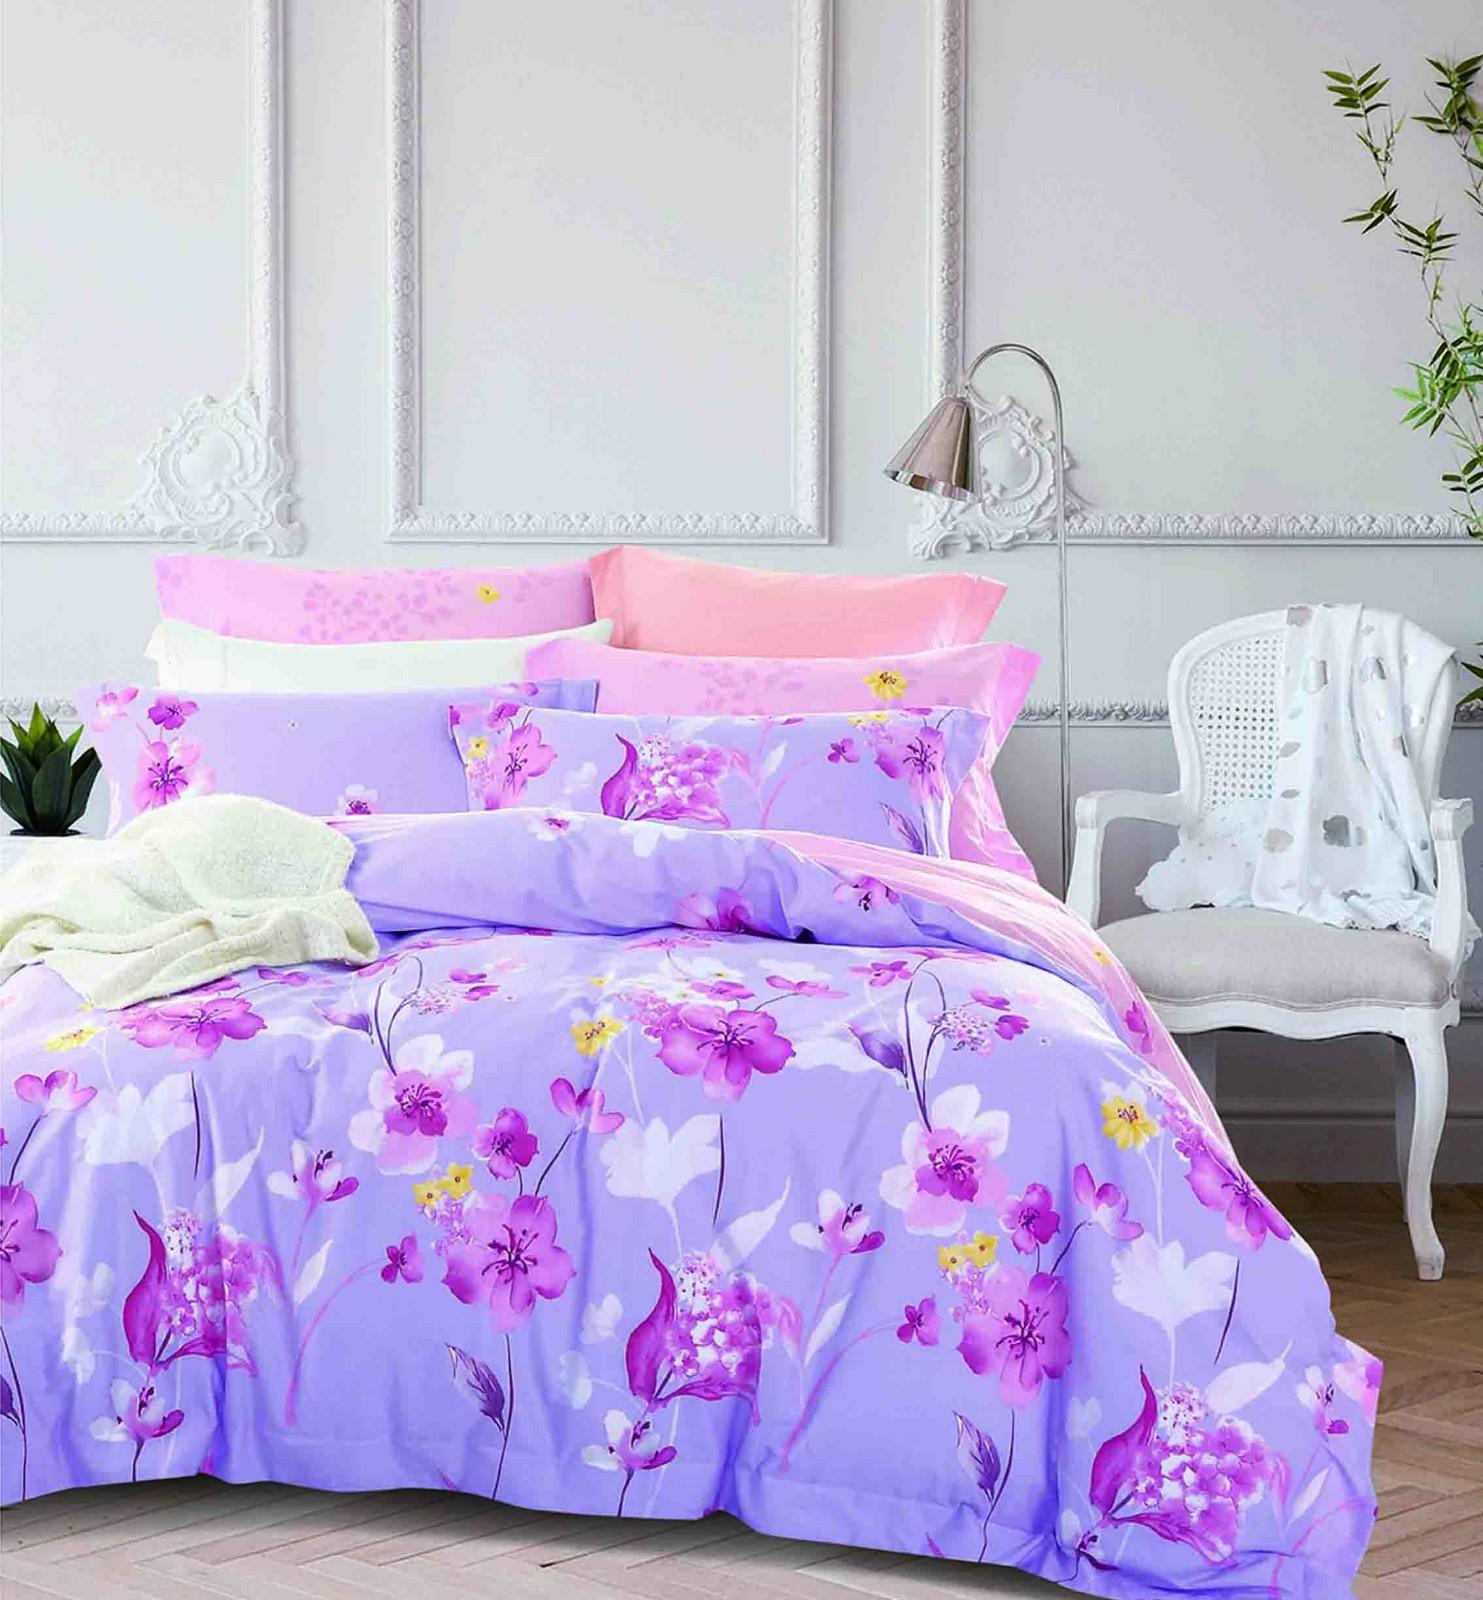 high Cotton Bedding Sets lovely patterned Daphne